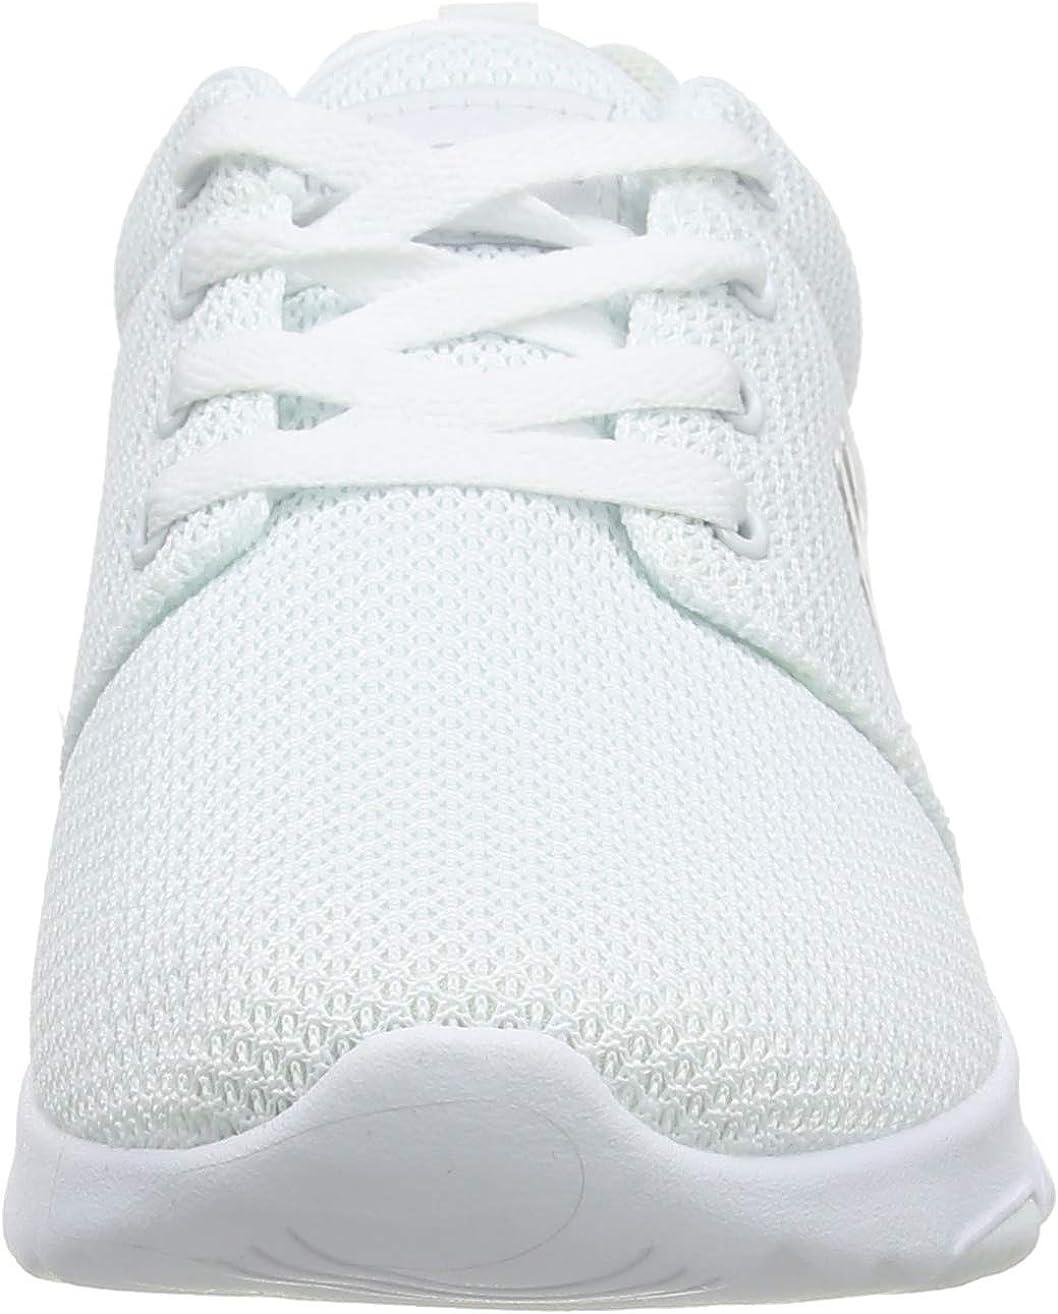 Kappa SASH, Men's Low-Top Trainers White White 1010